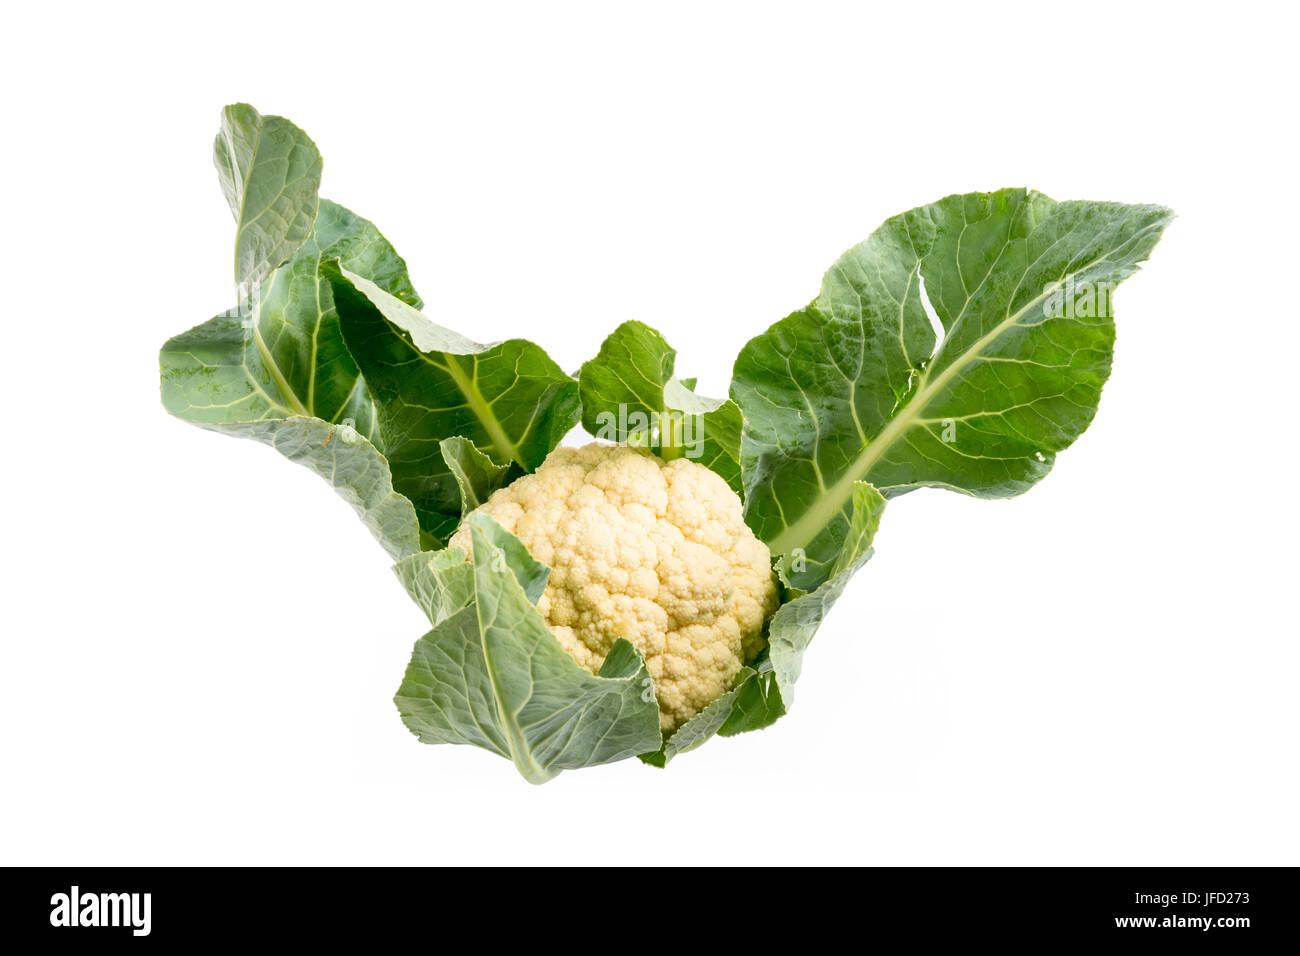 cauliflower on white - Stock Image